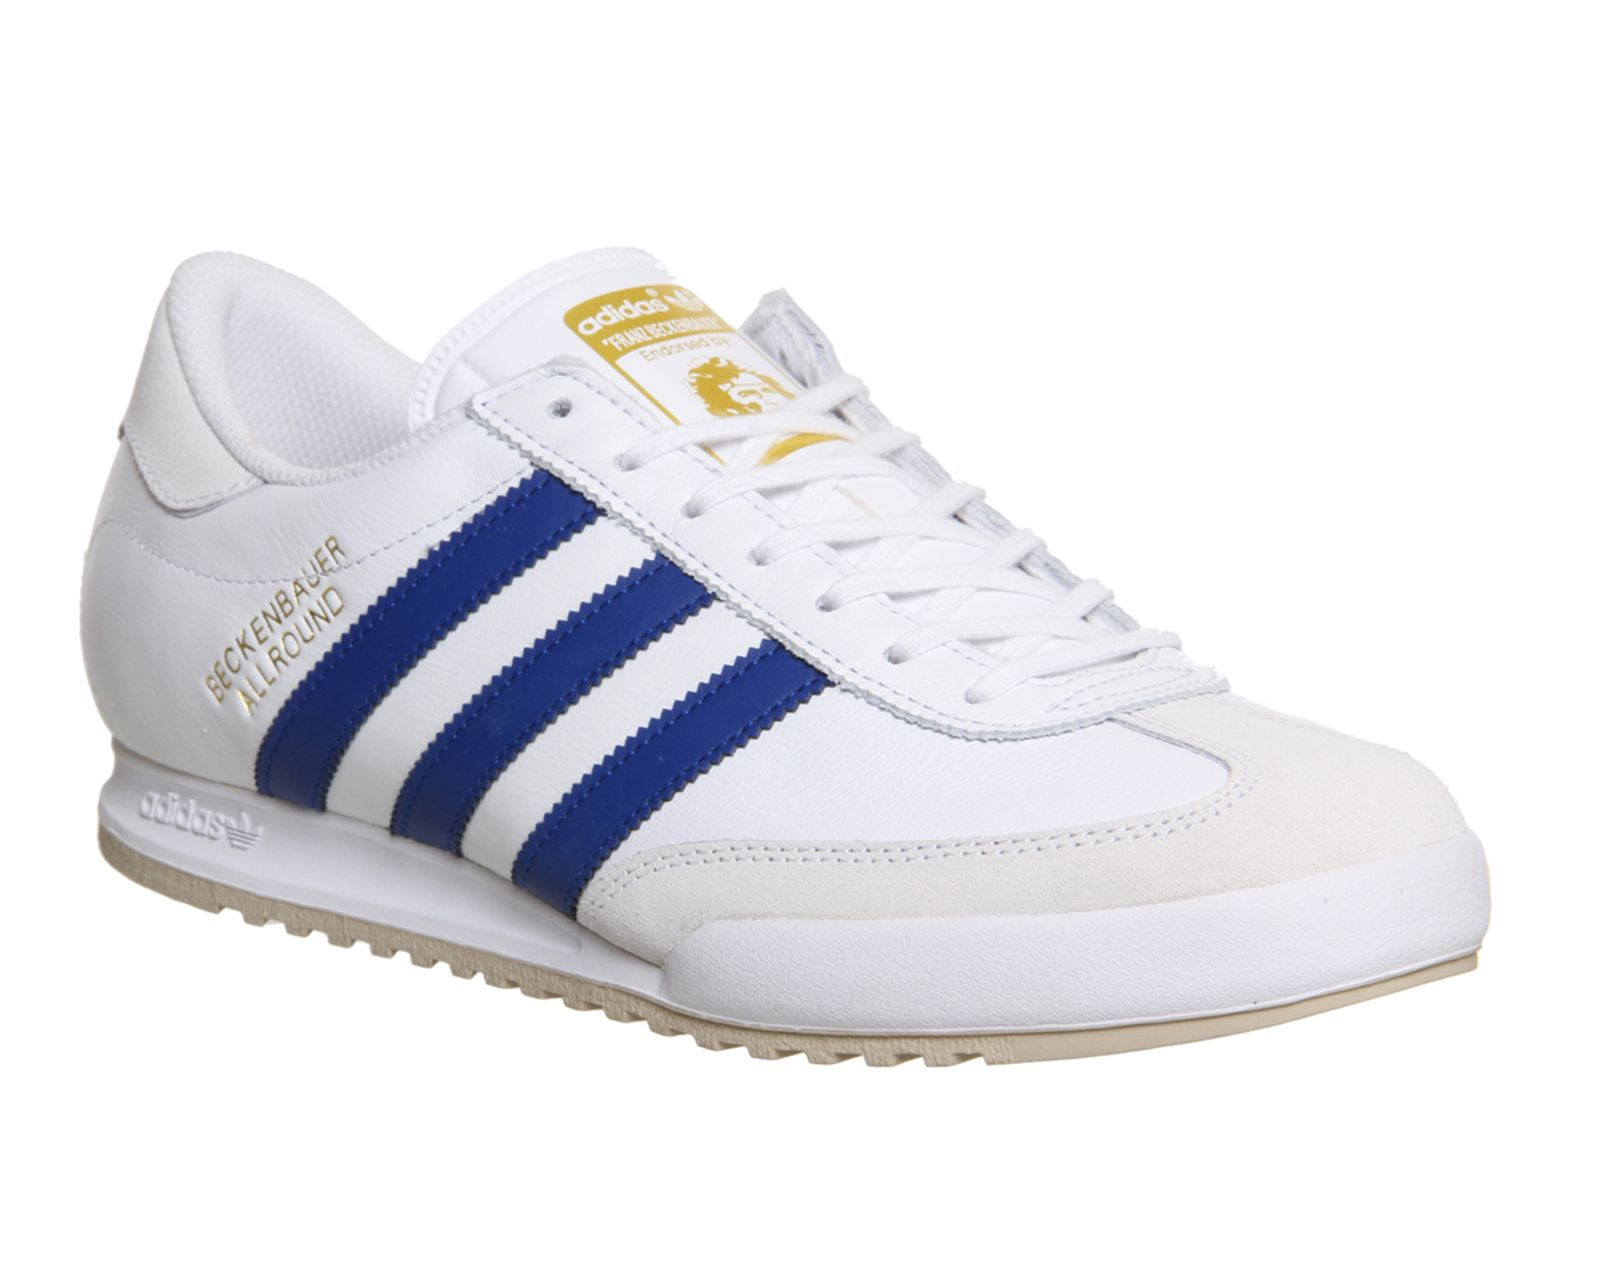 adidas beckenbauer schoenen